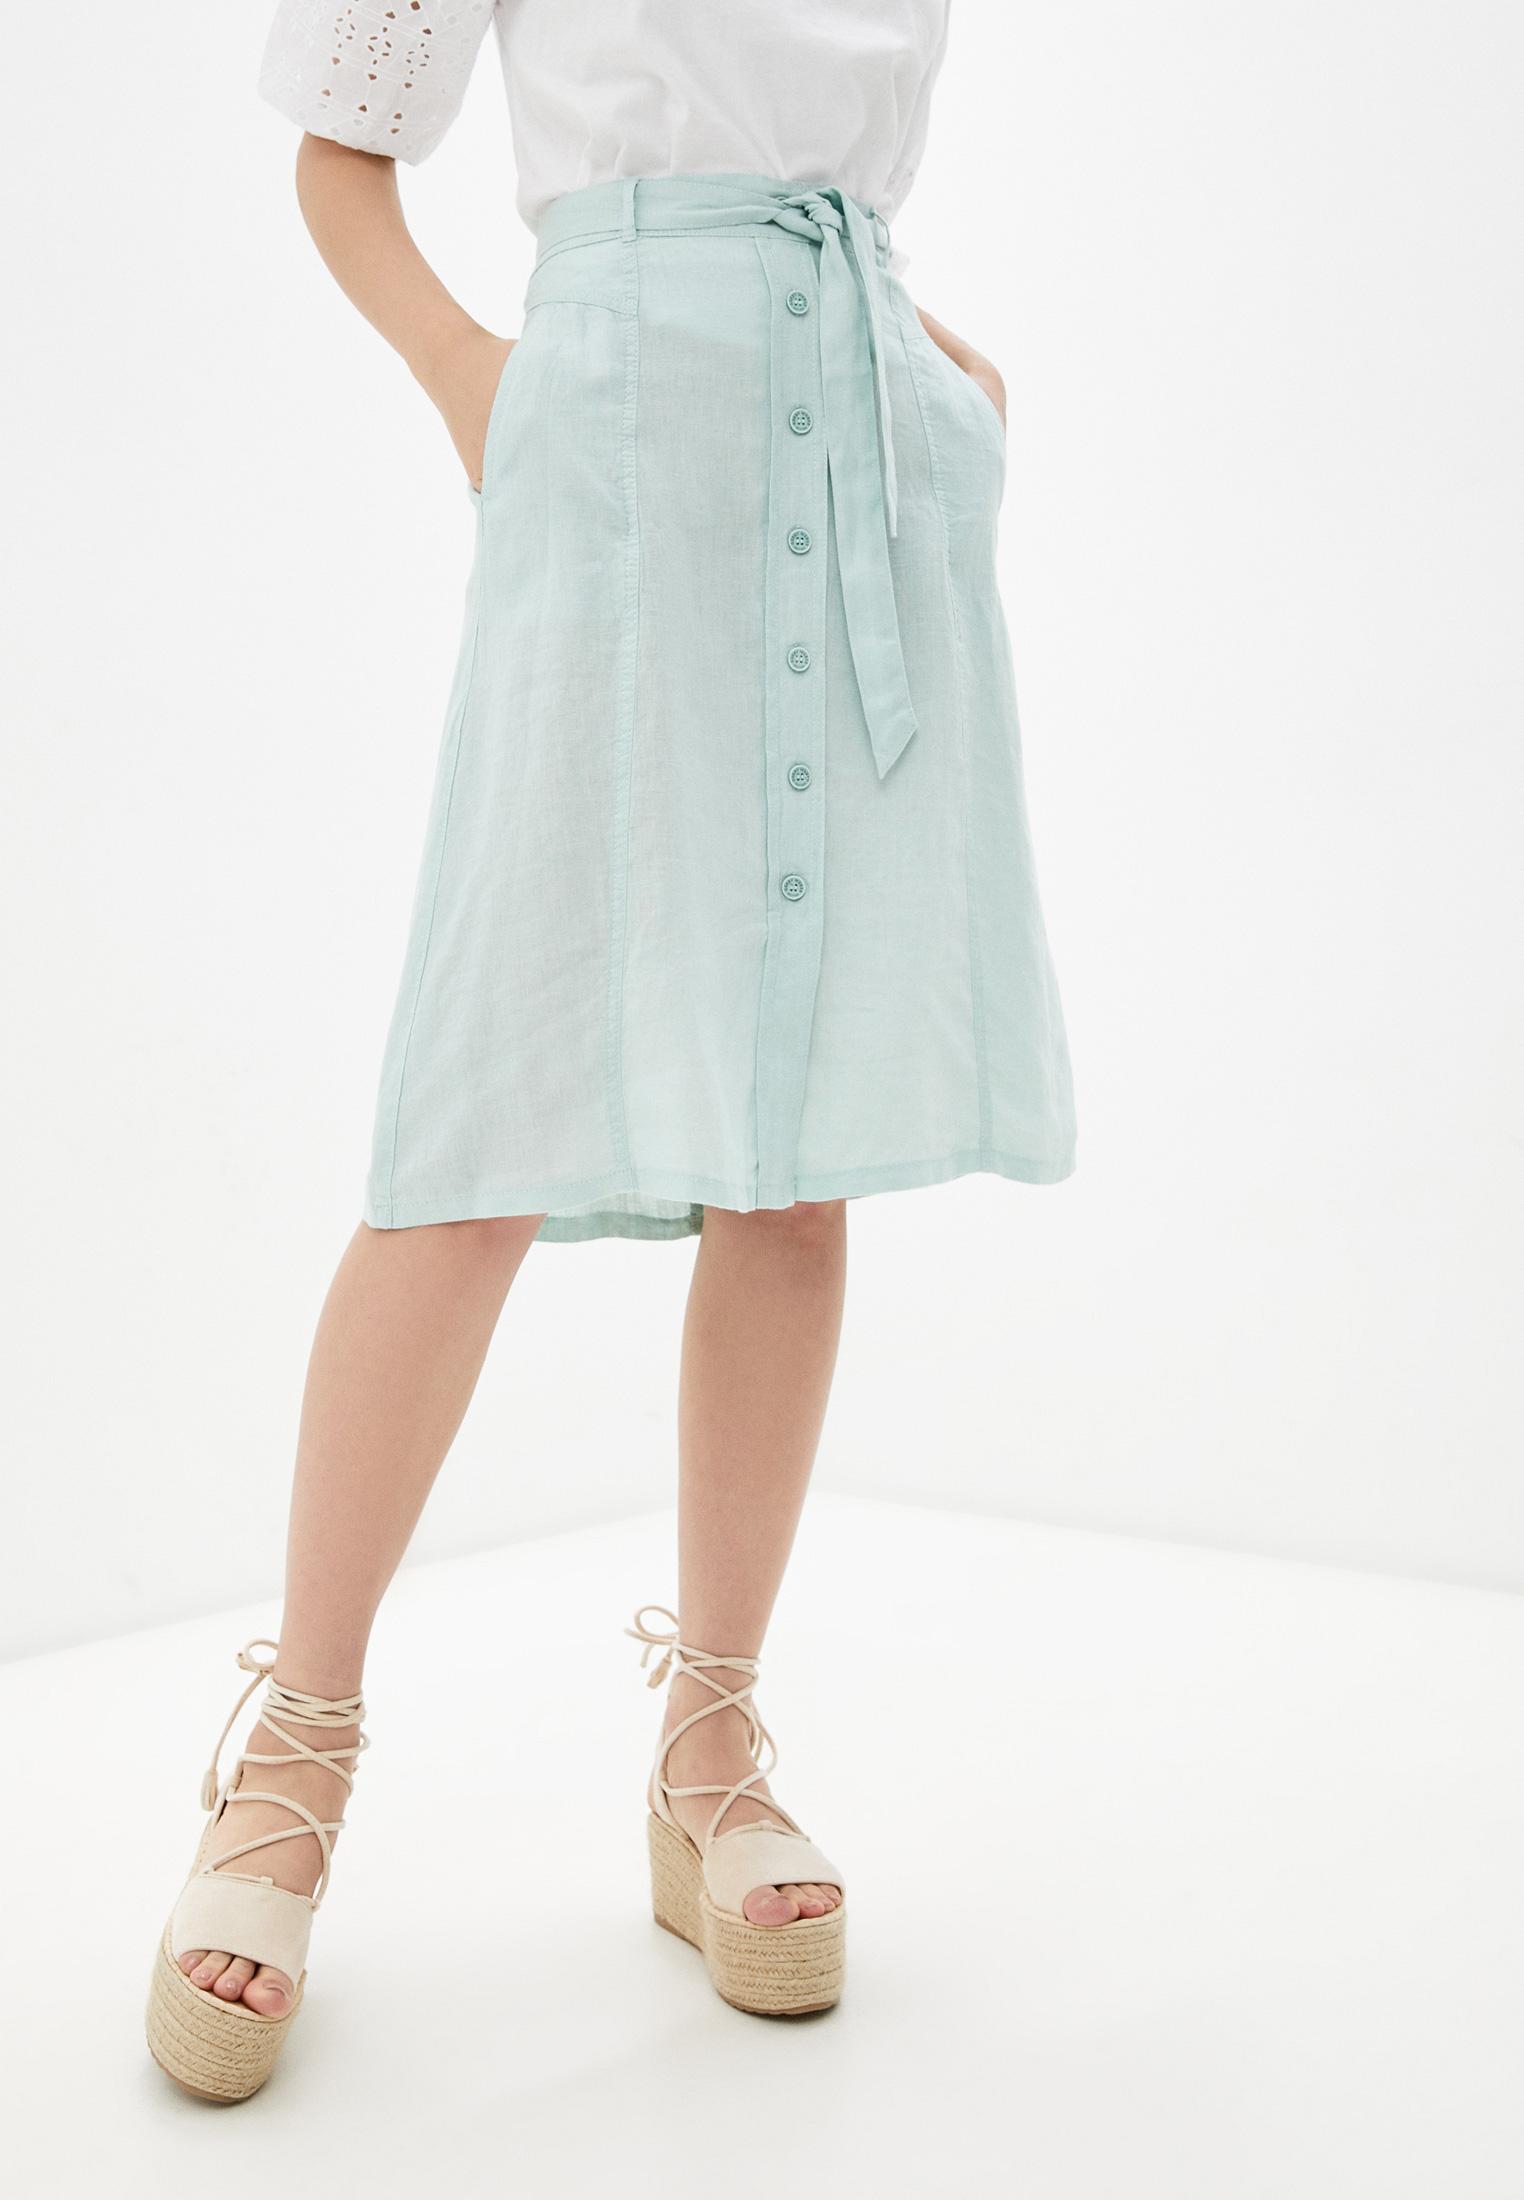 Широкая юбка Gerry Weber (Гарри Вебер) 410110-66633